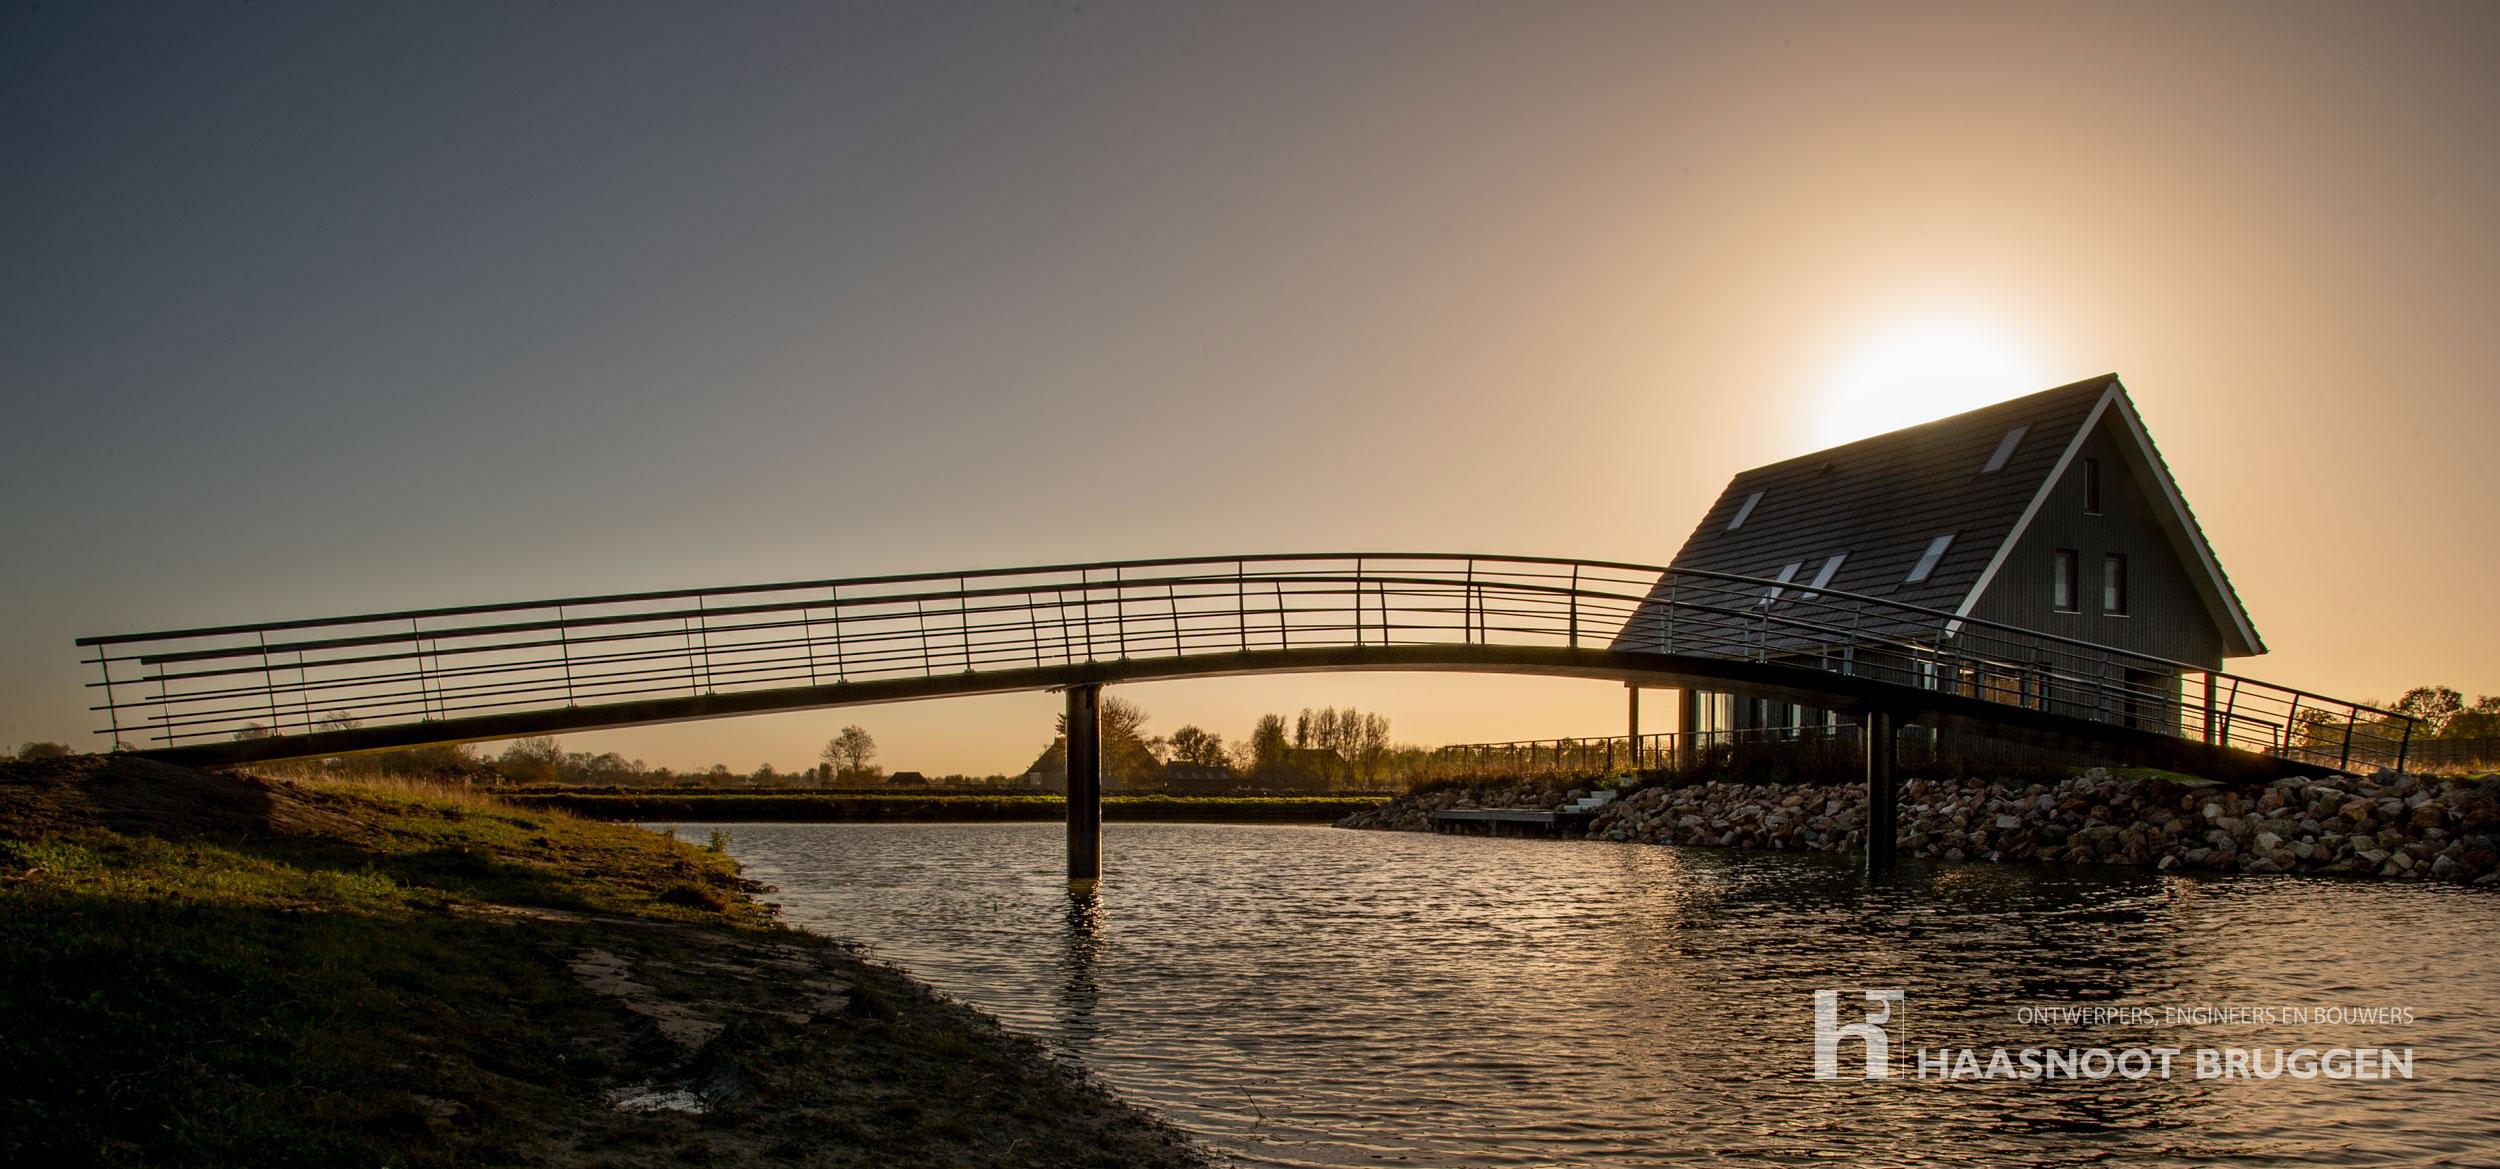 Fraaie bruggen in Friesland